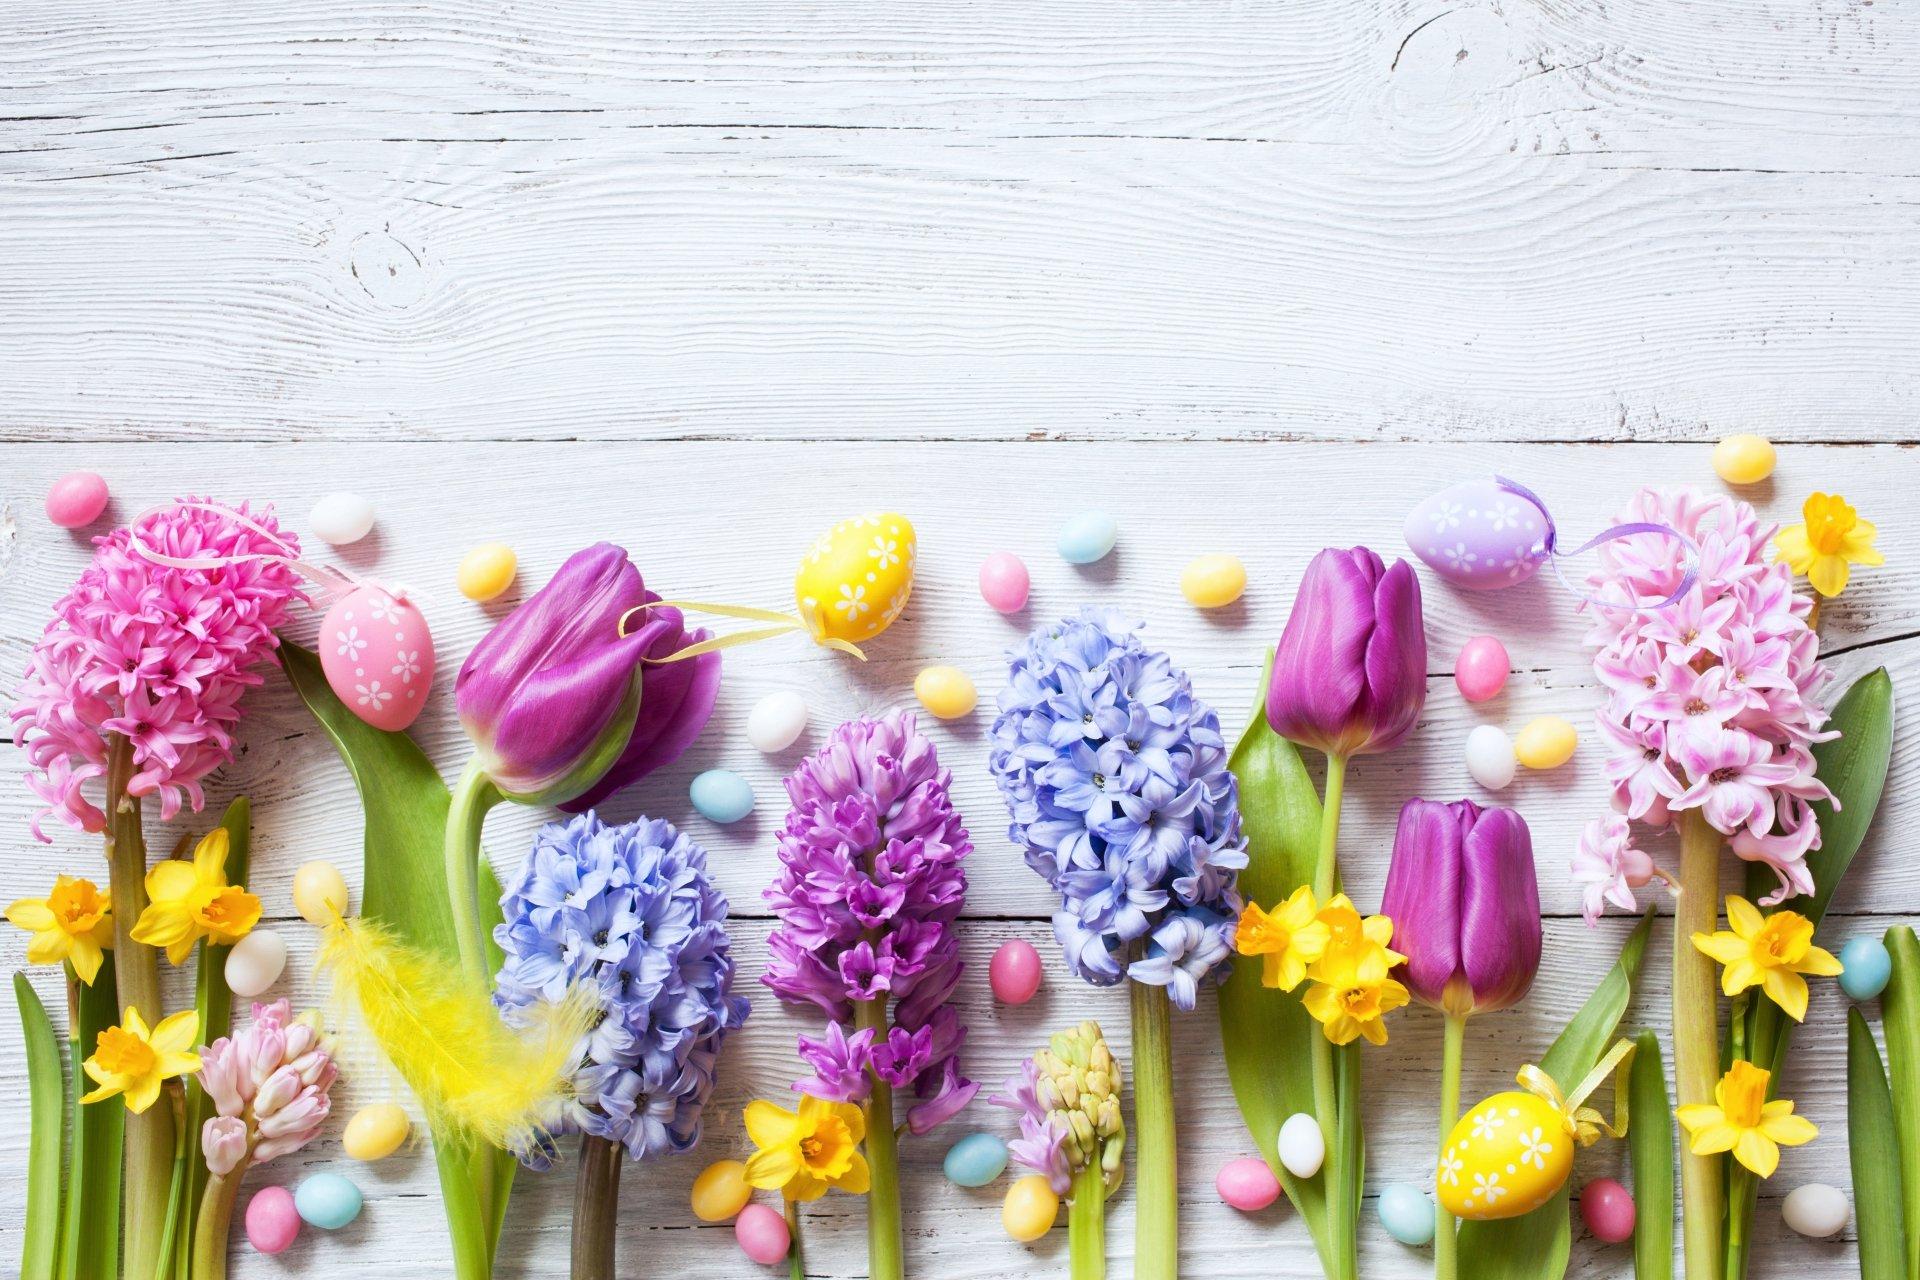 Man Made - Flower  Tulip Daffodil Pink Flower Yellow Flower Blue Flower Purple Flower Wallpaper